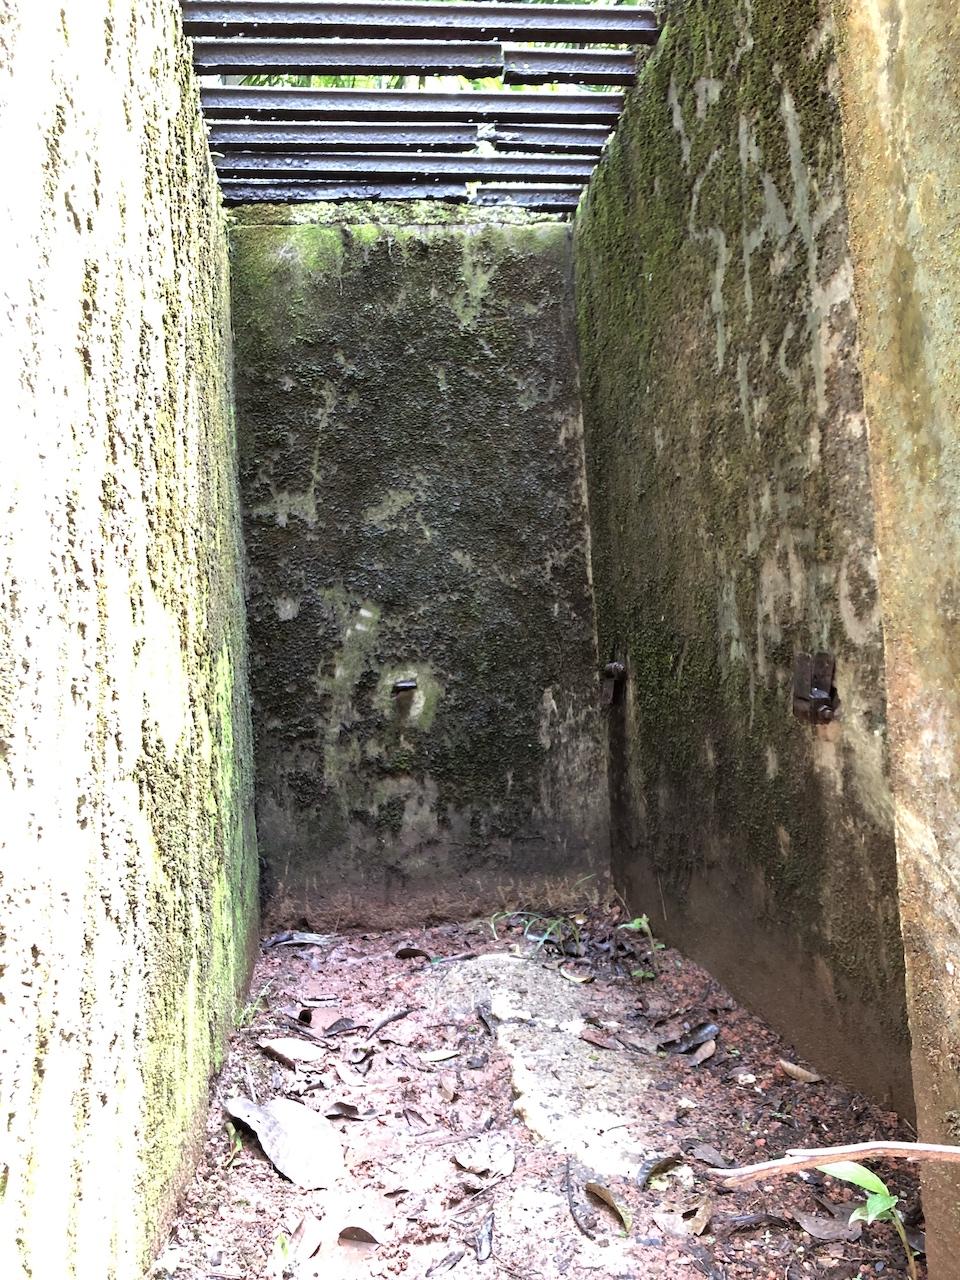 jungle prison room.jpg